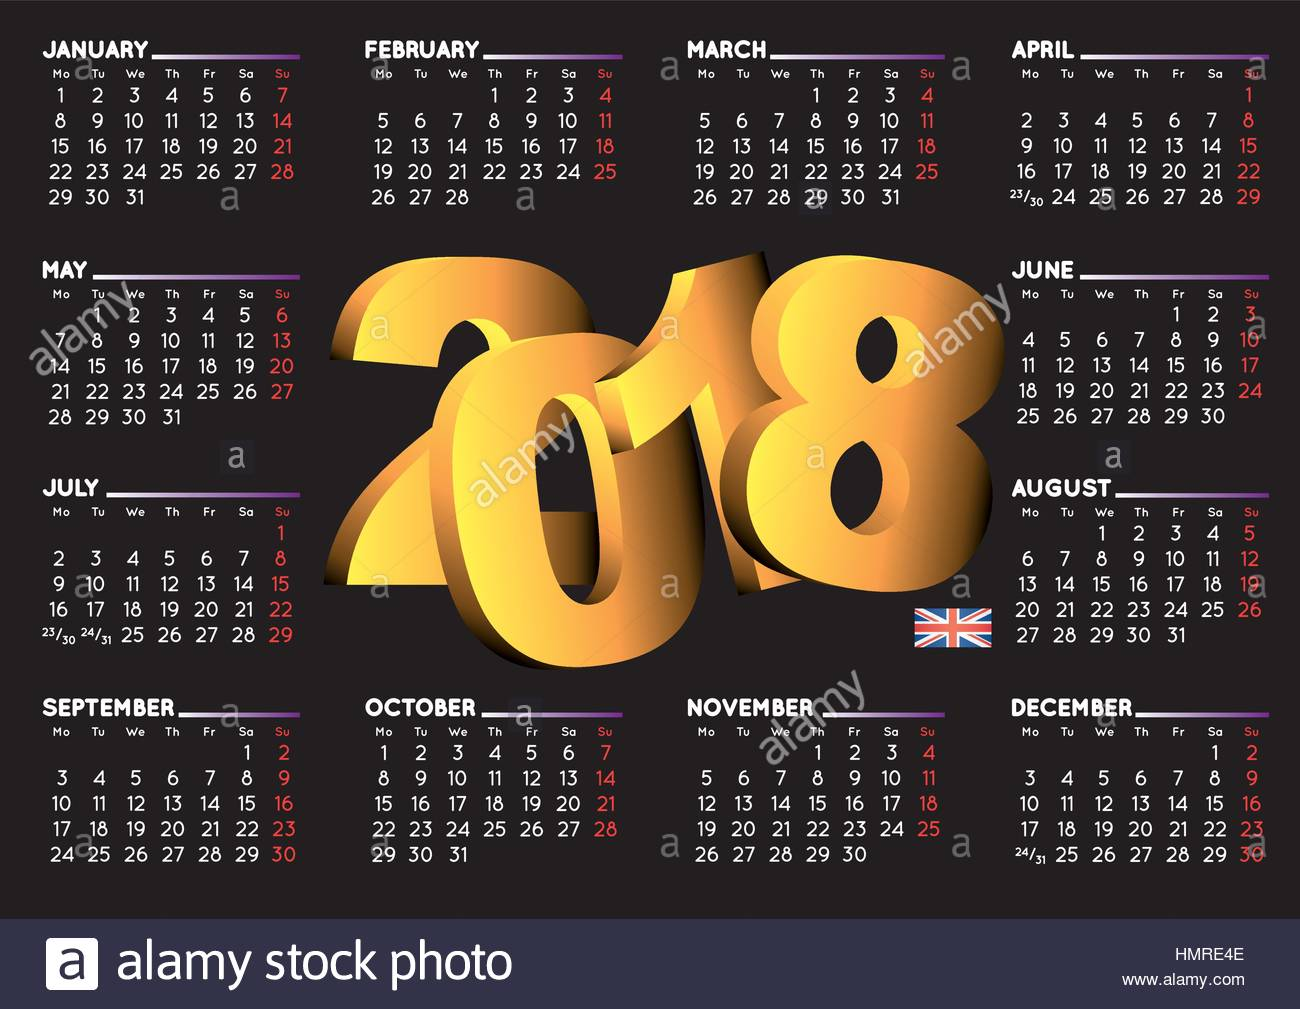 2018 black calendar in english year 2018 calendar calendar 2018 stock vector art. Black Bedroom Furniture Sets. Home Design Ideas